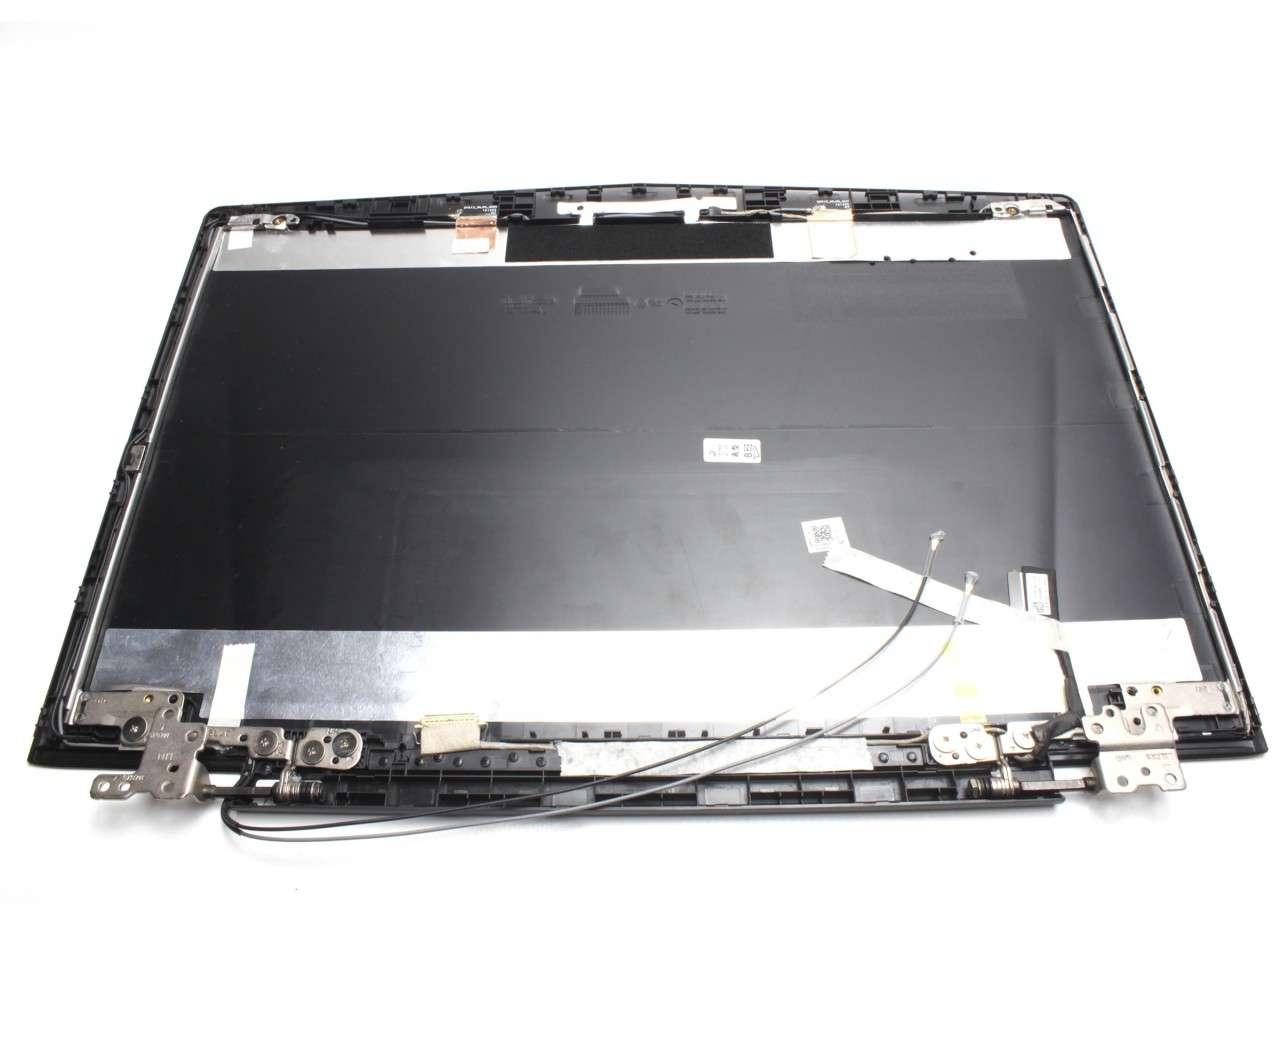 Capac Display BackCover Lenovo Legion R720-15IKB Carcasa Display cu Balamale imagine powerlaptop.ro 2021